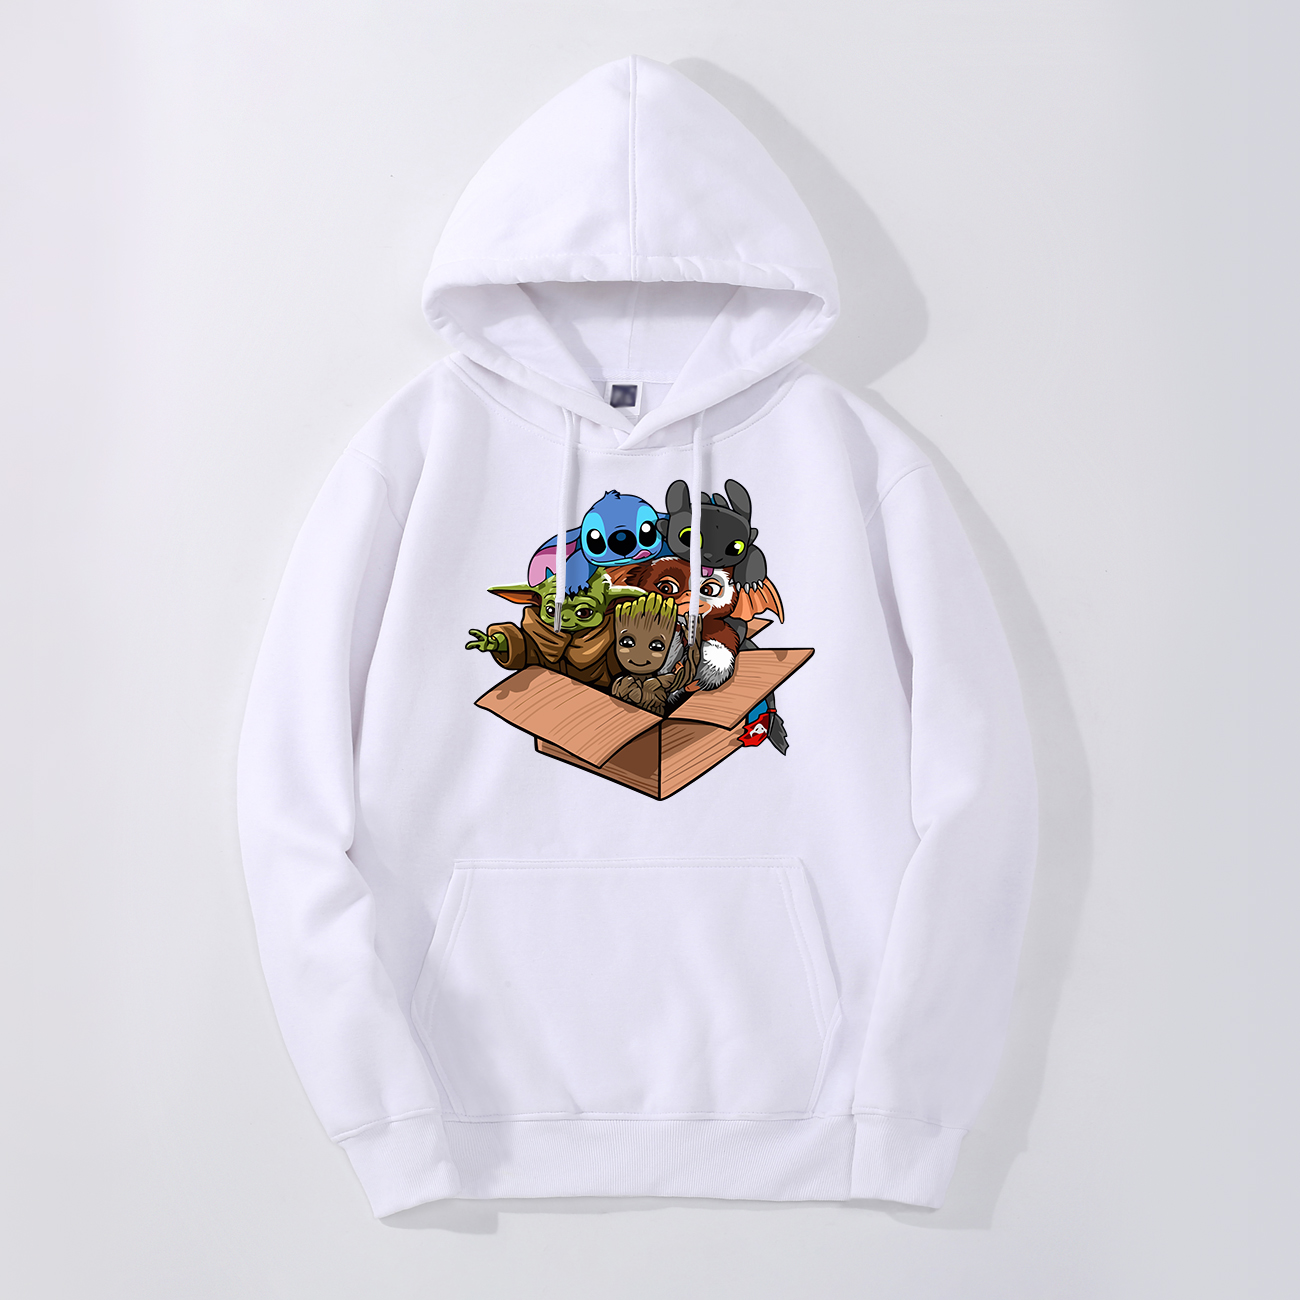 Kawaii Full Team Men's Hoodies Spring Autumn Baby Yoda Young Cute Groot Hoodies Sweatshirts Men Fleece Tops Hoodies Sweatshirt